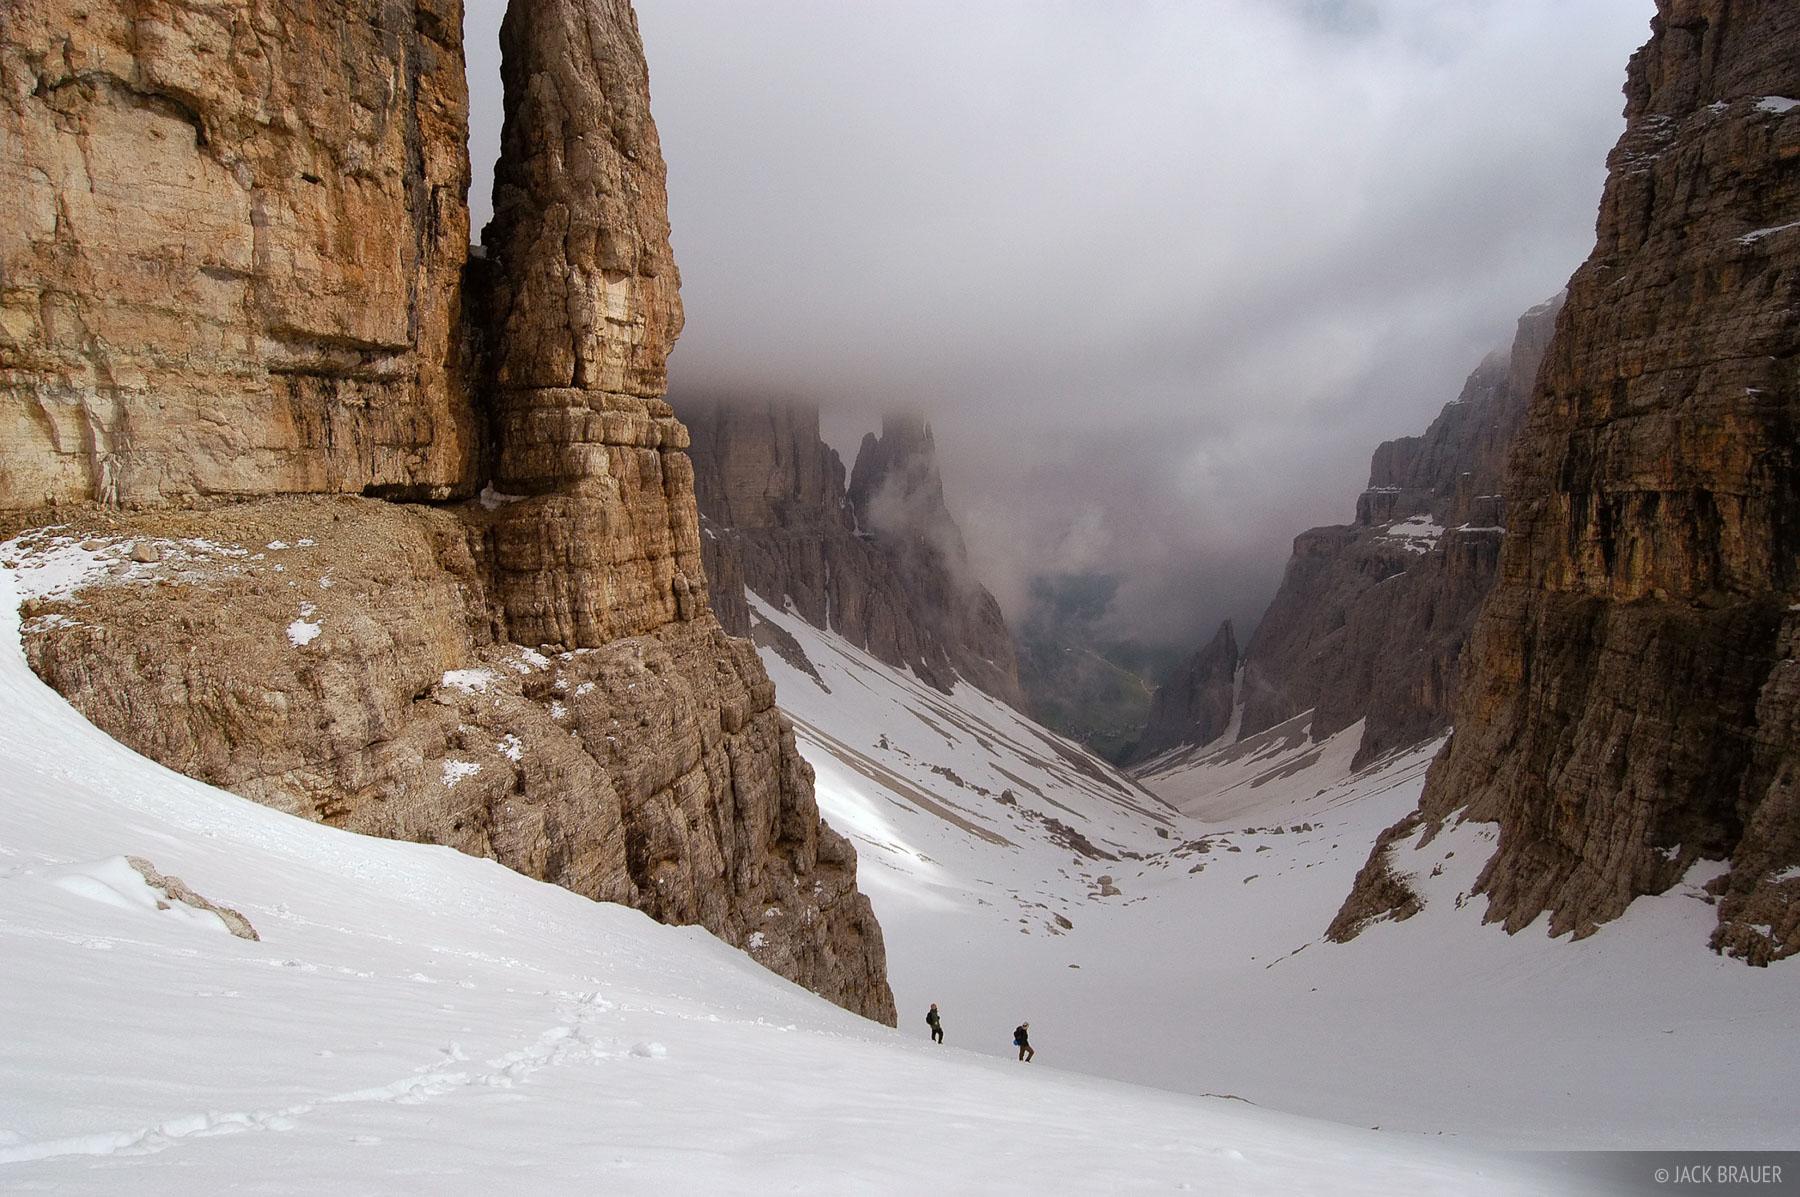 Val de Mesdi, Sella group, Corvara, Dolomites, Italy, photo